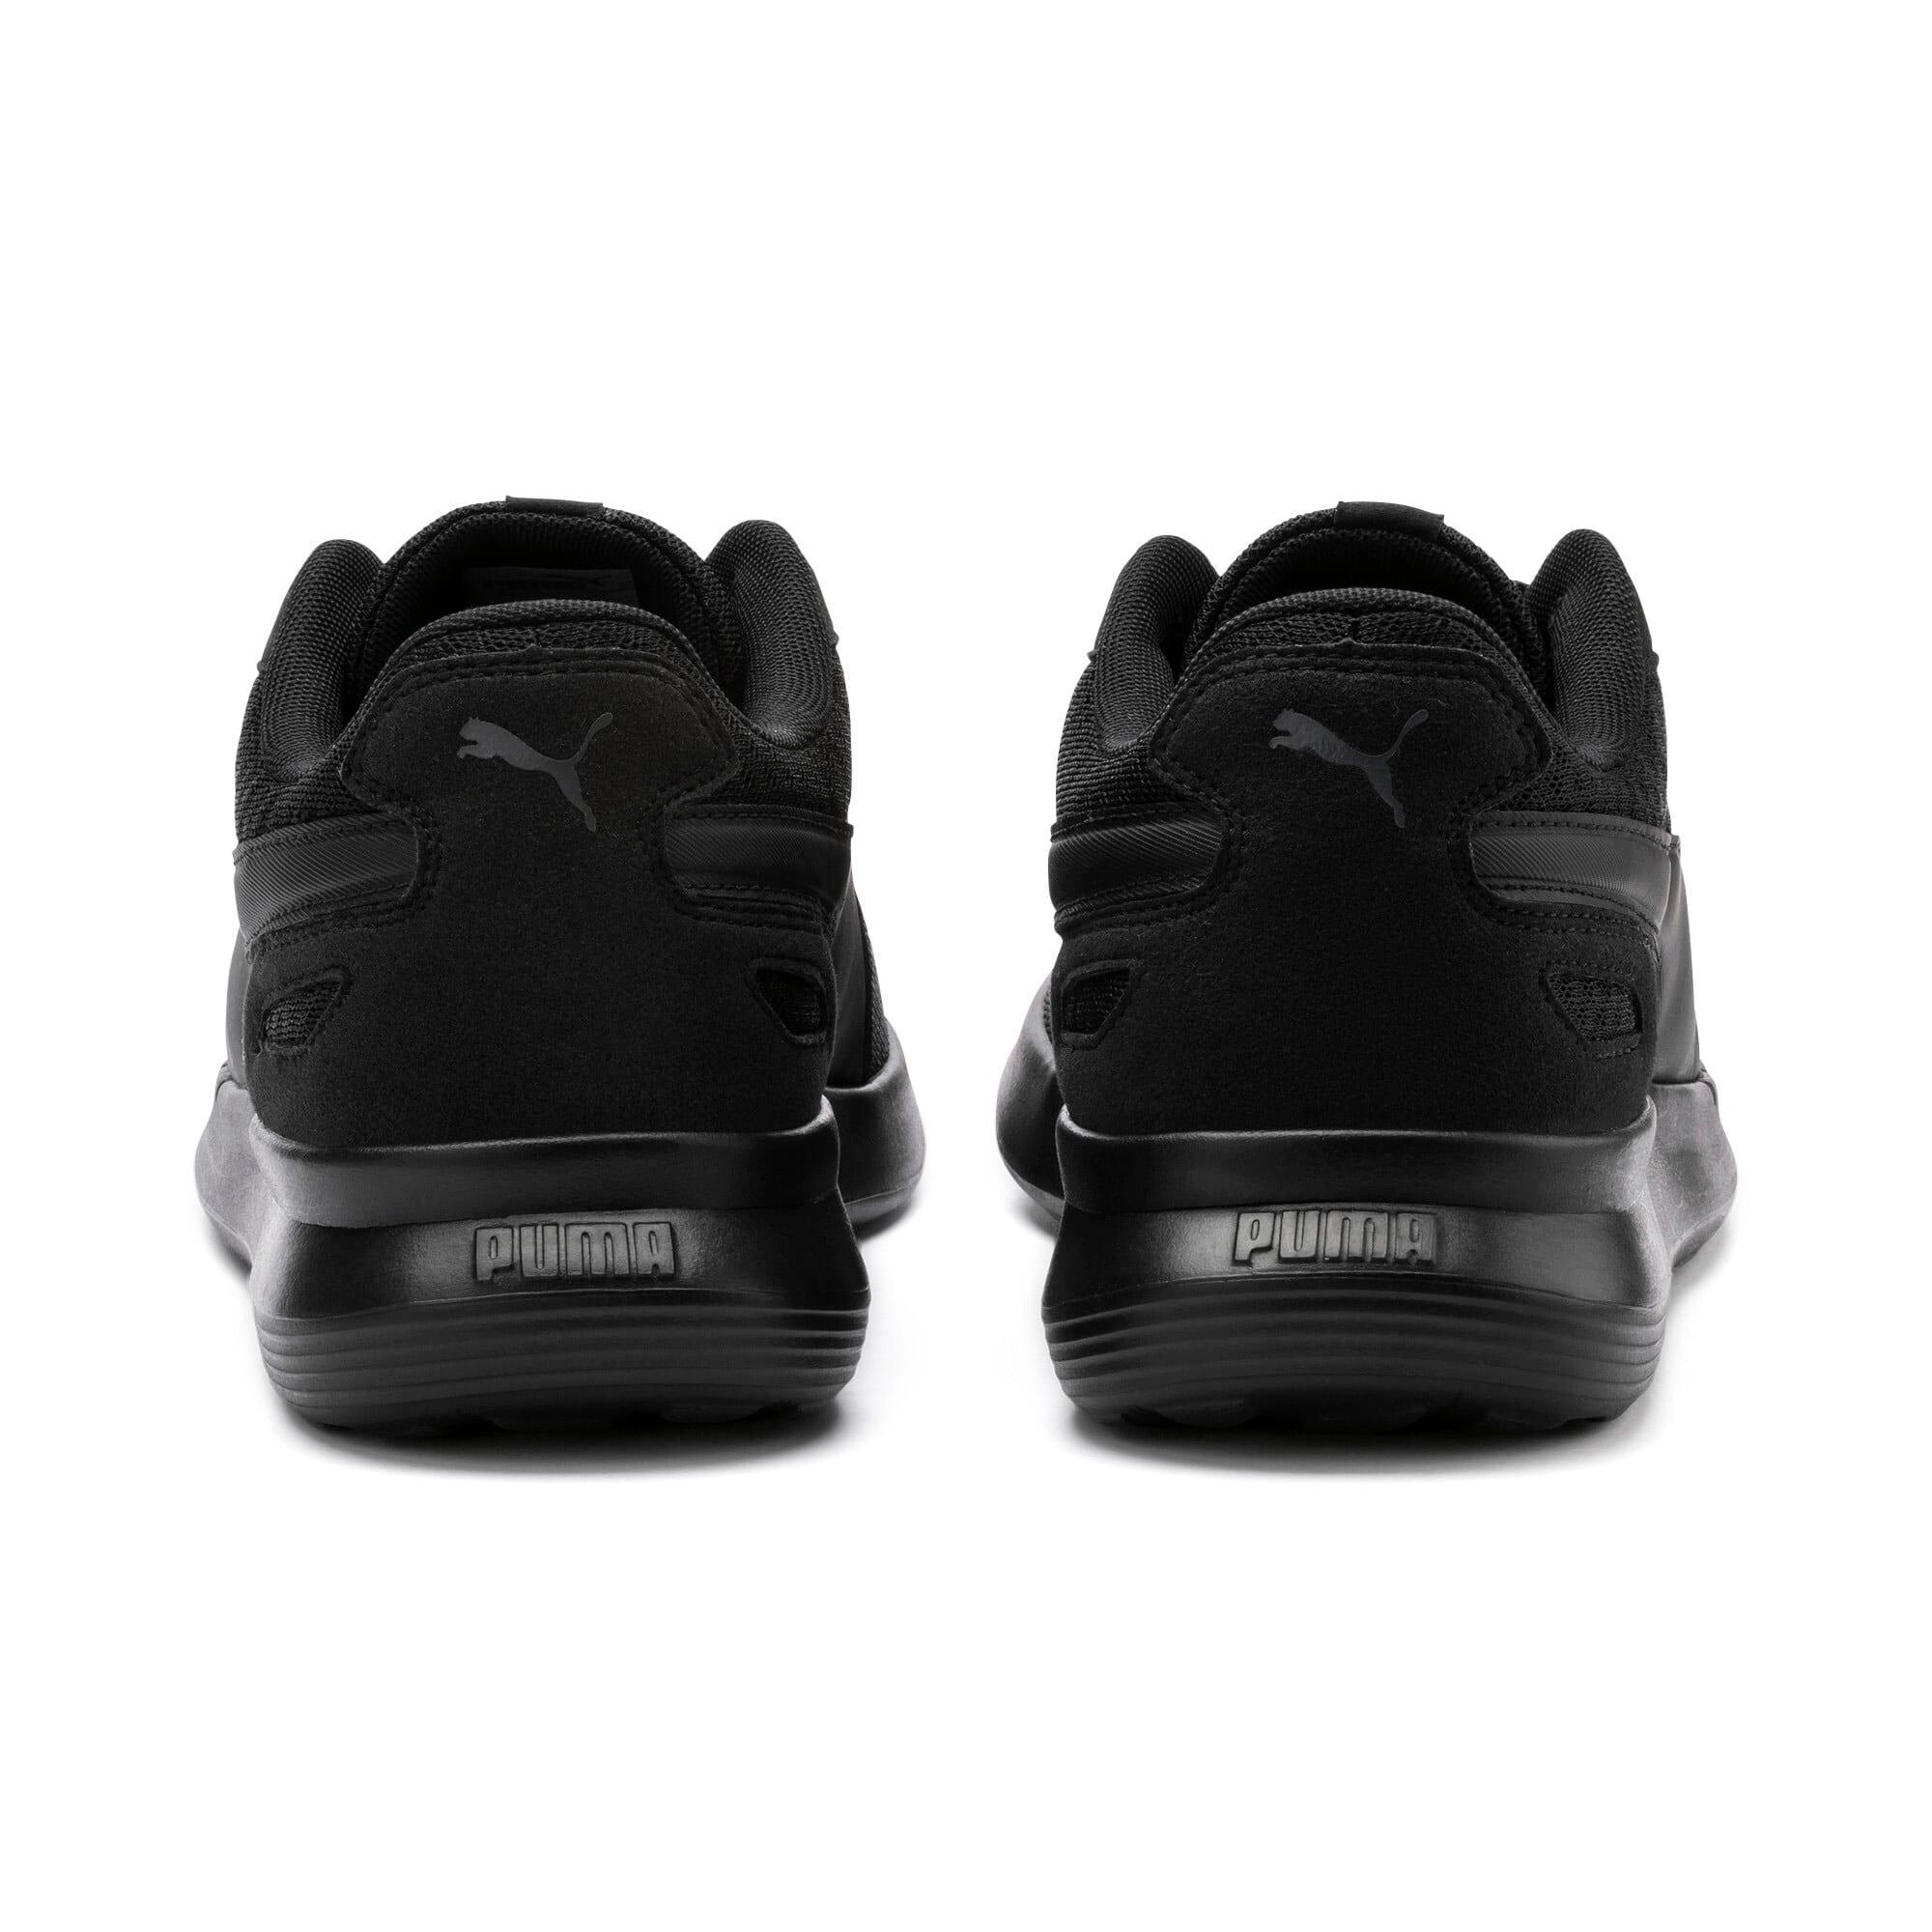 Thumbnail 4 of ST Activate Sneakers, Puma Black-Puma Black, medium